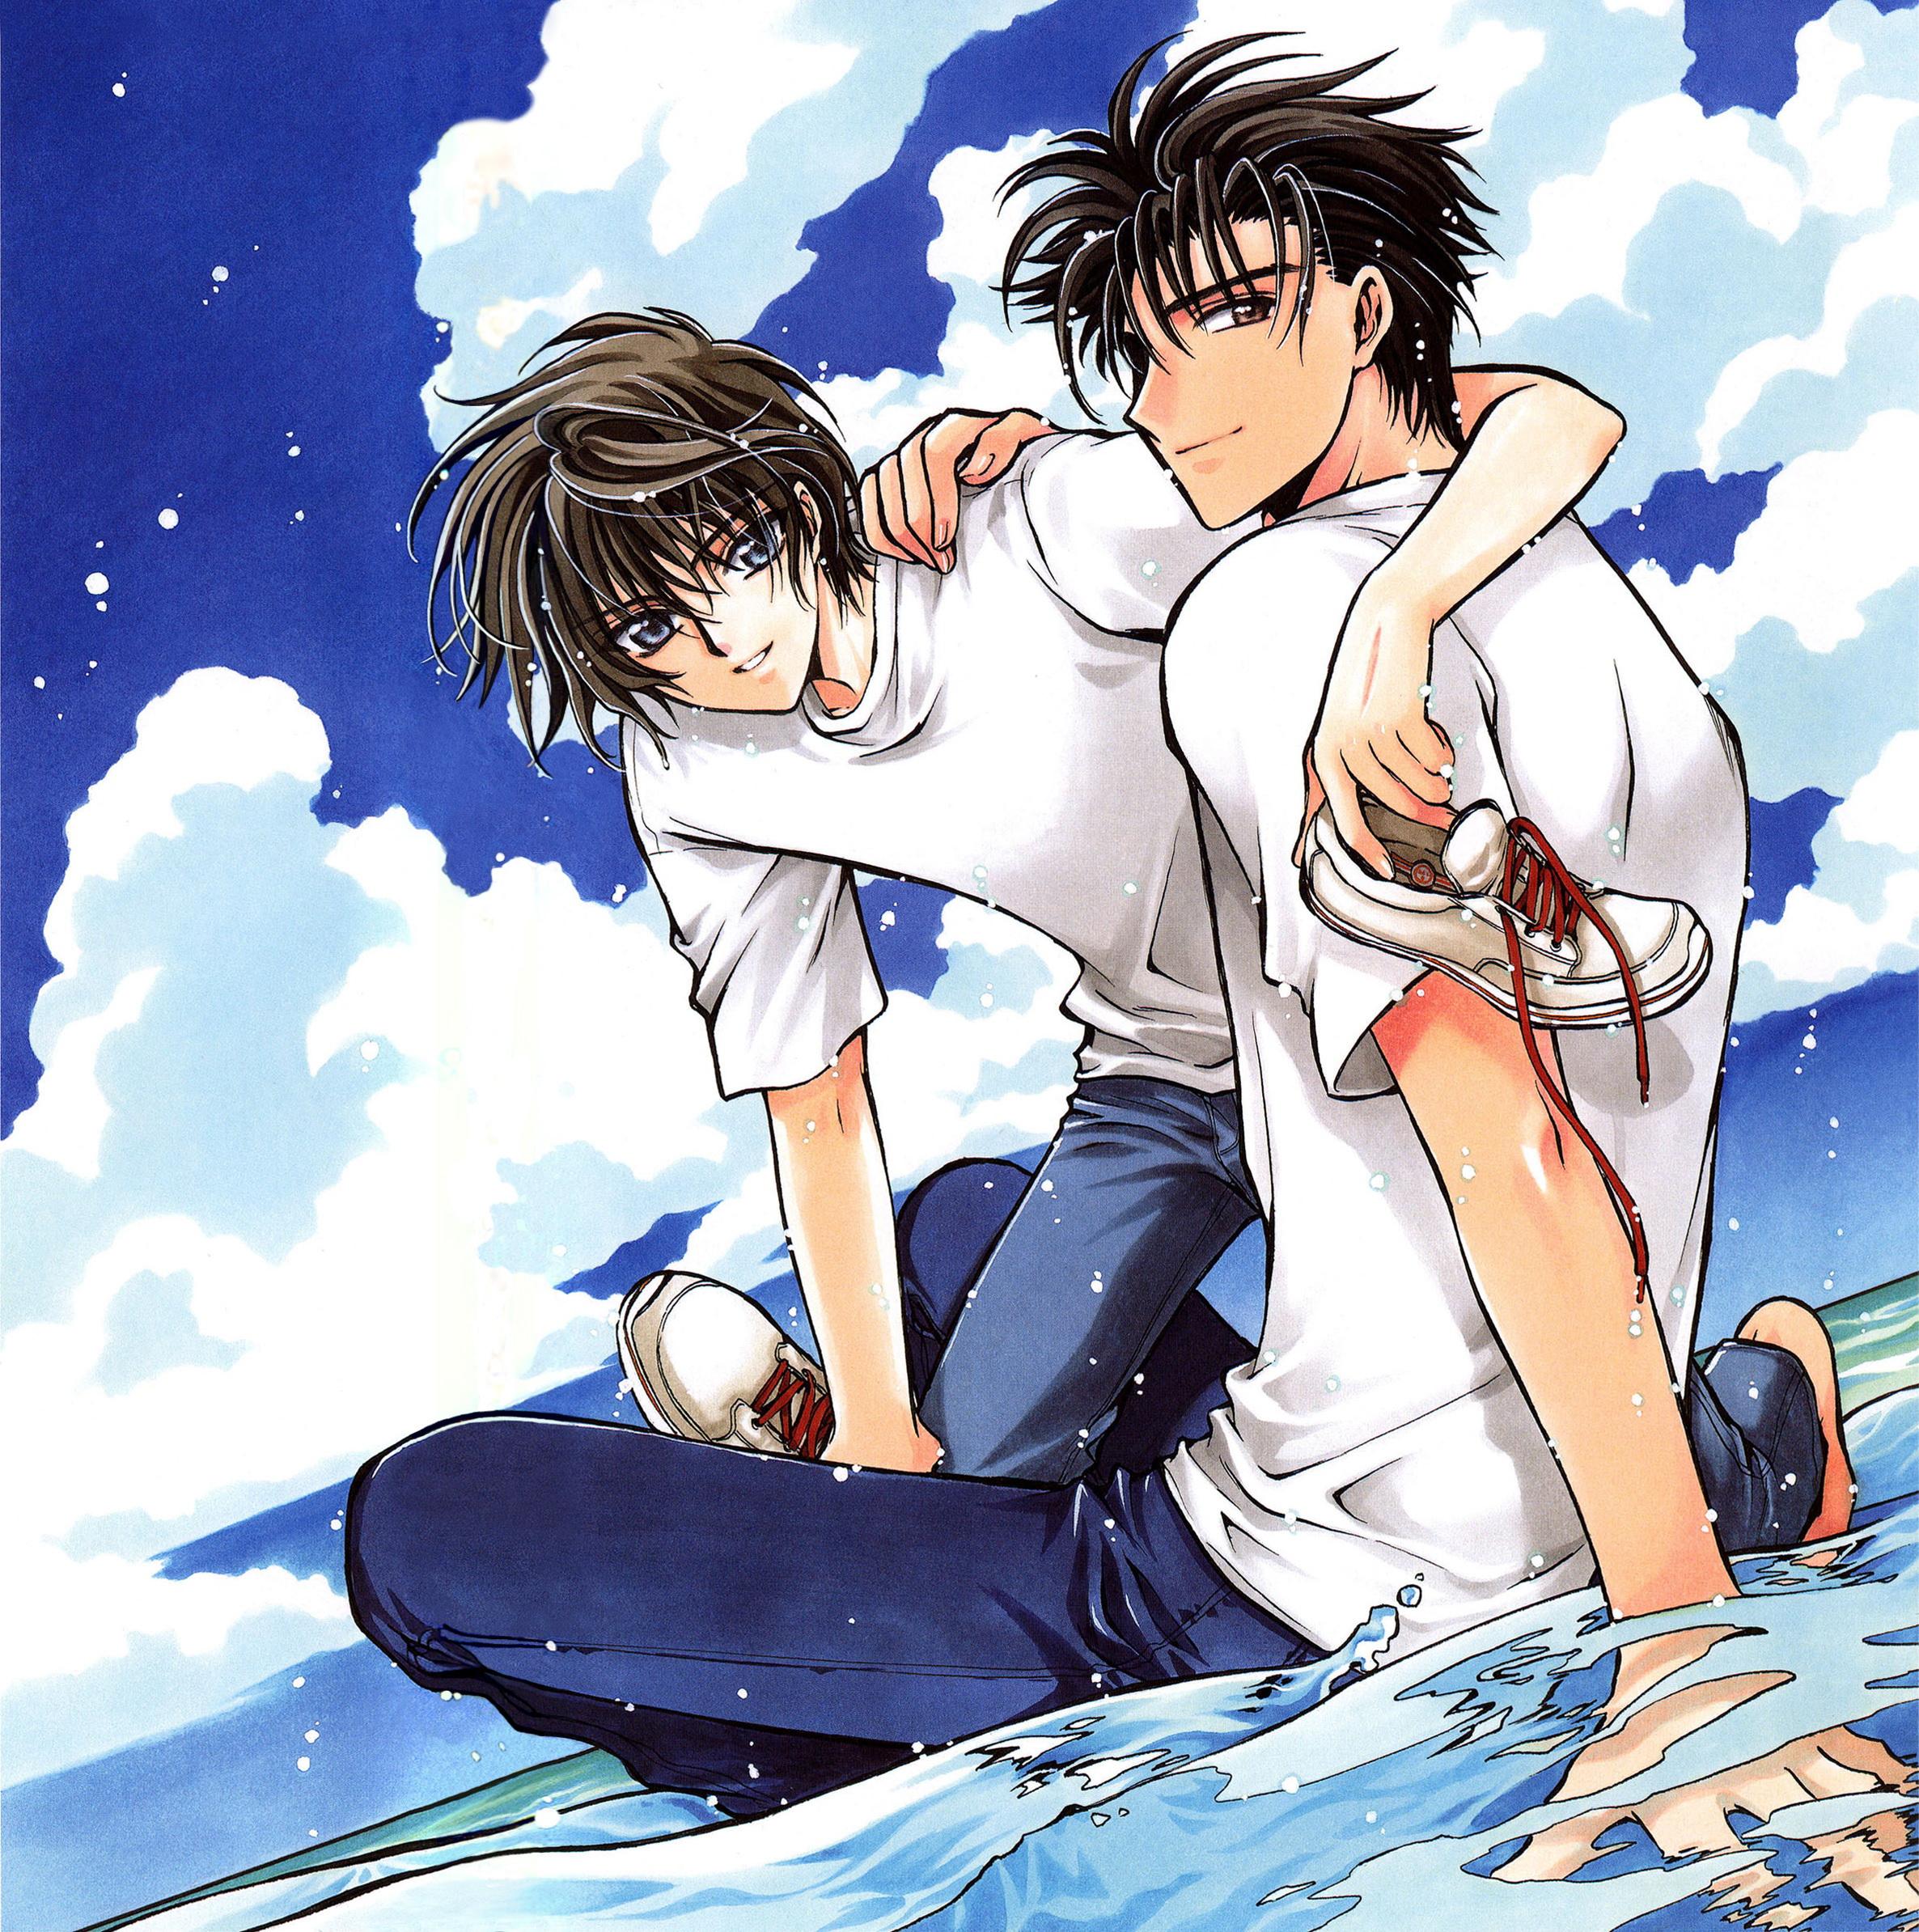 Kamui Shirou Tokyo Revelations: Kamui Shirou And Fuuma Monou (X/1999)